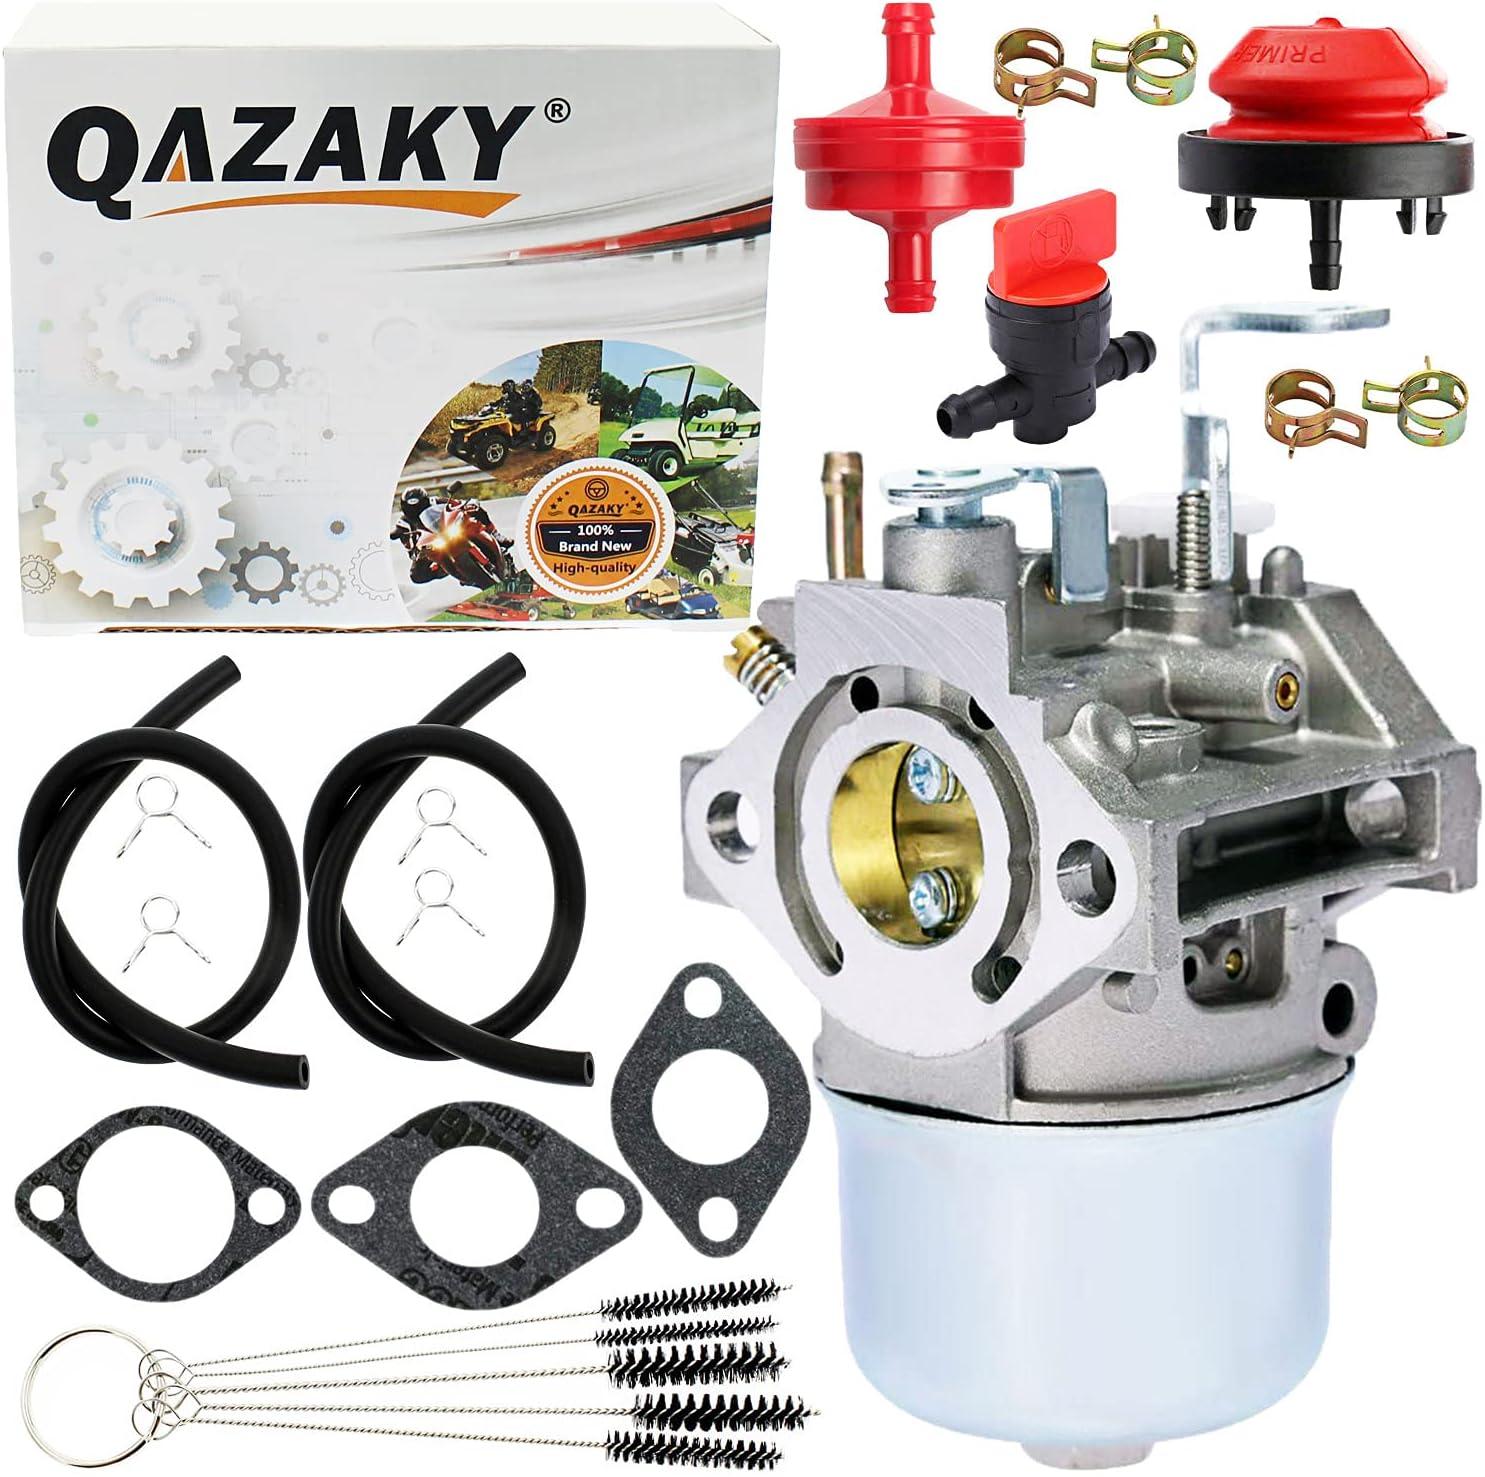 QAZAKY Carburetor Kit Rapid rise Compatible Max 78% OFF with CCR2000 Snowb Toro CCR3000